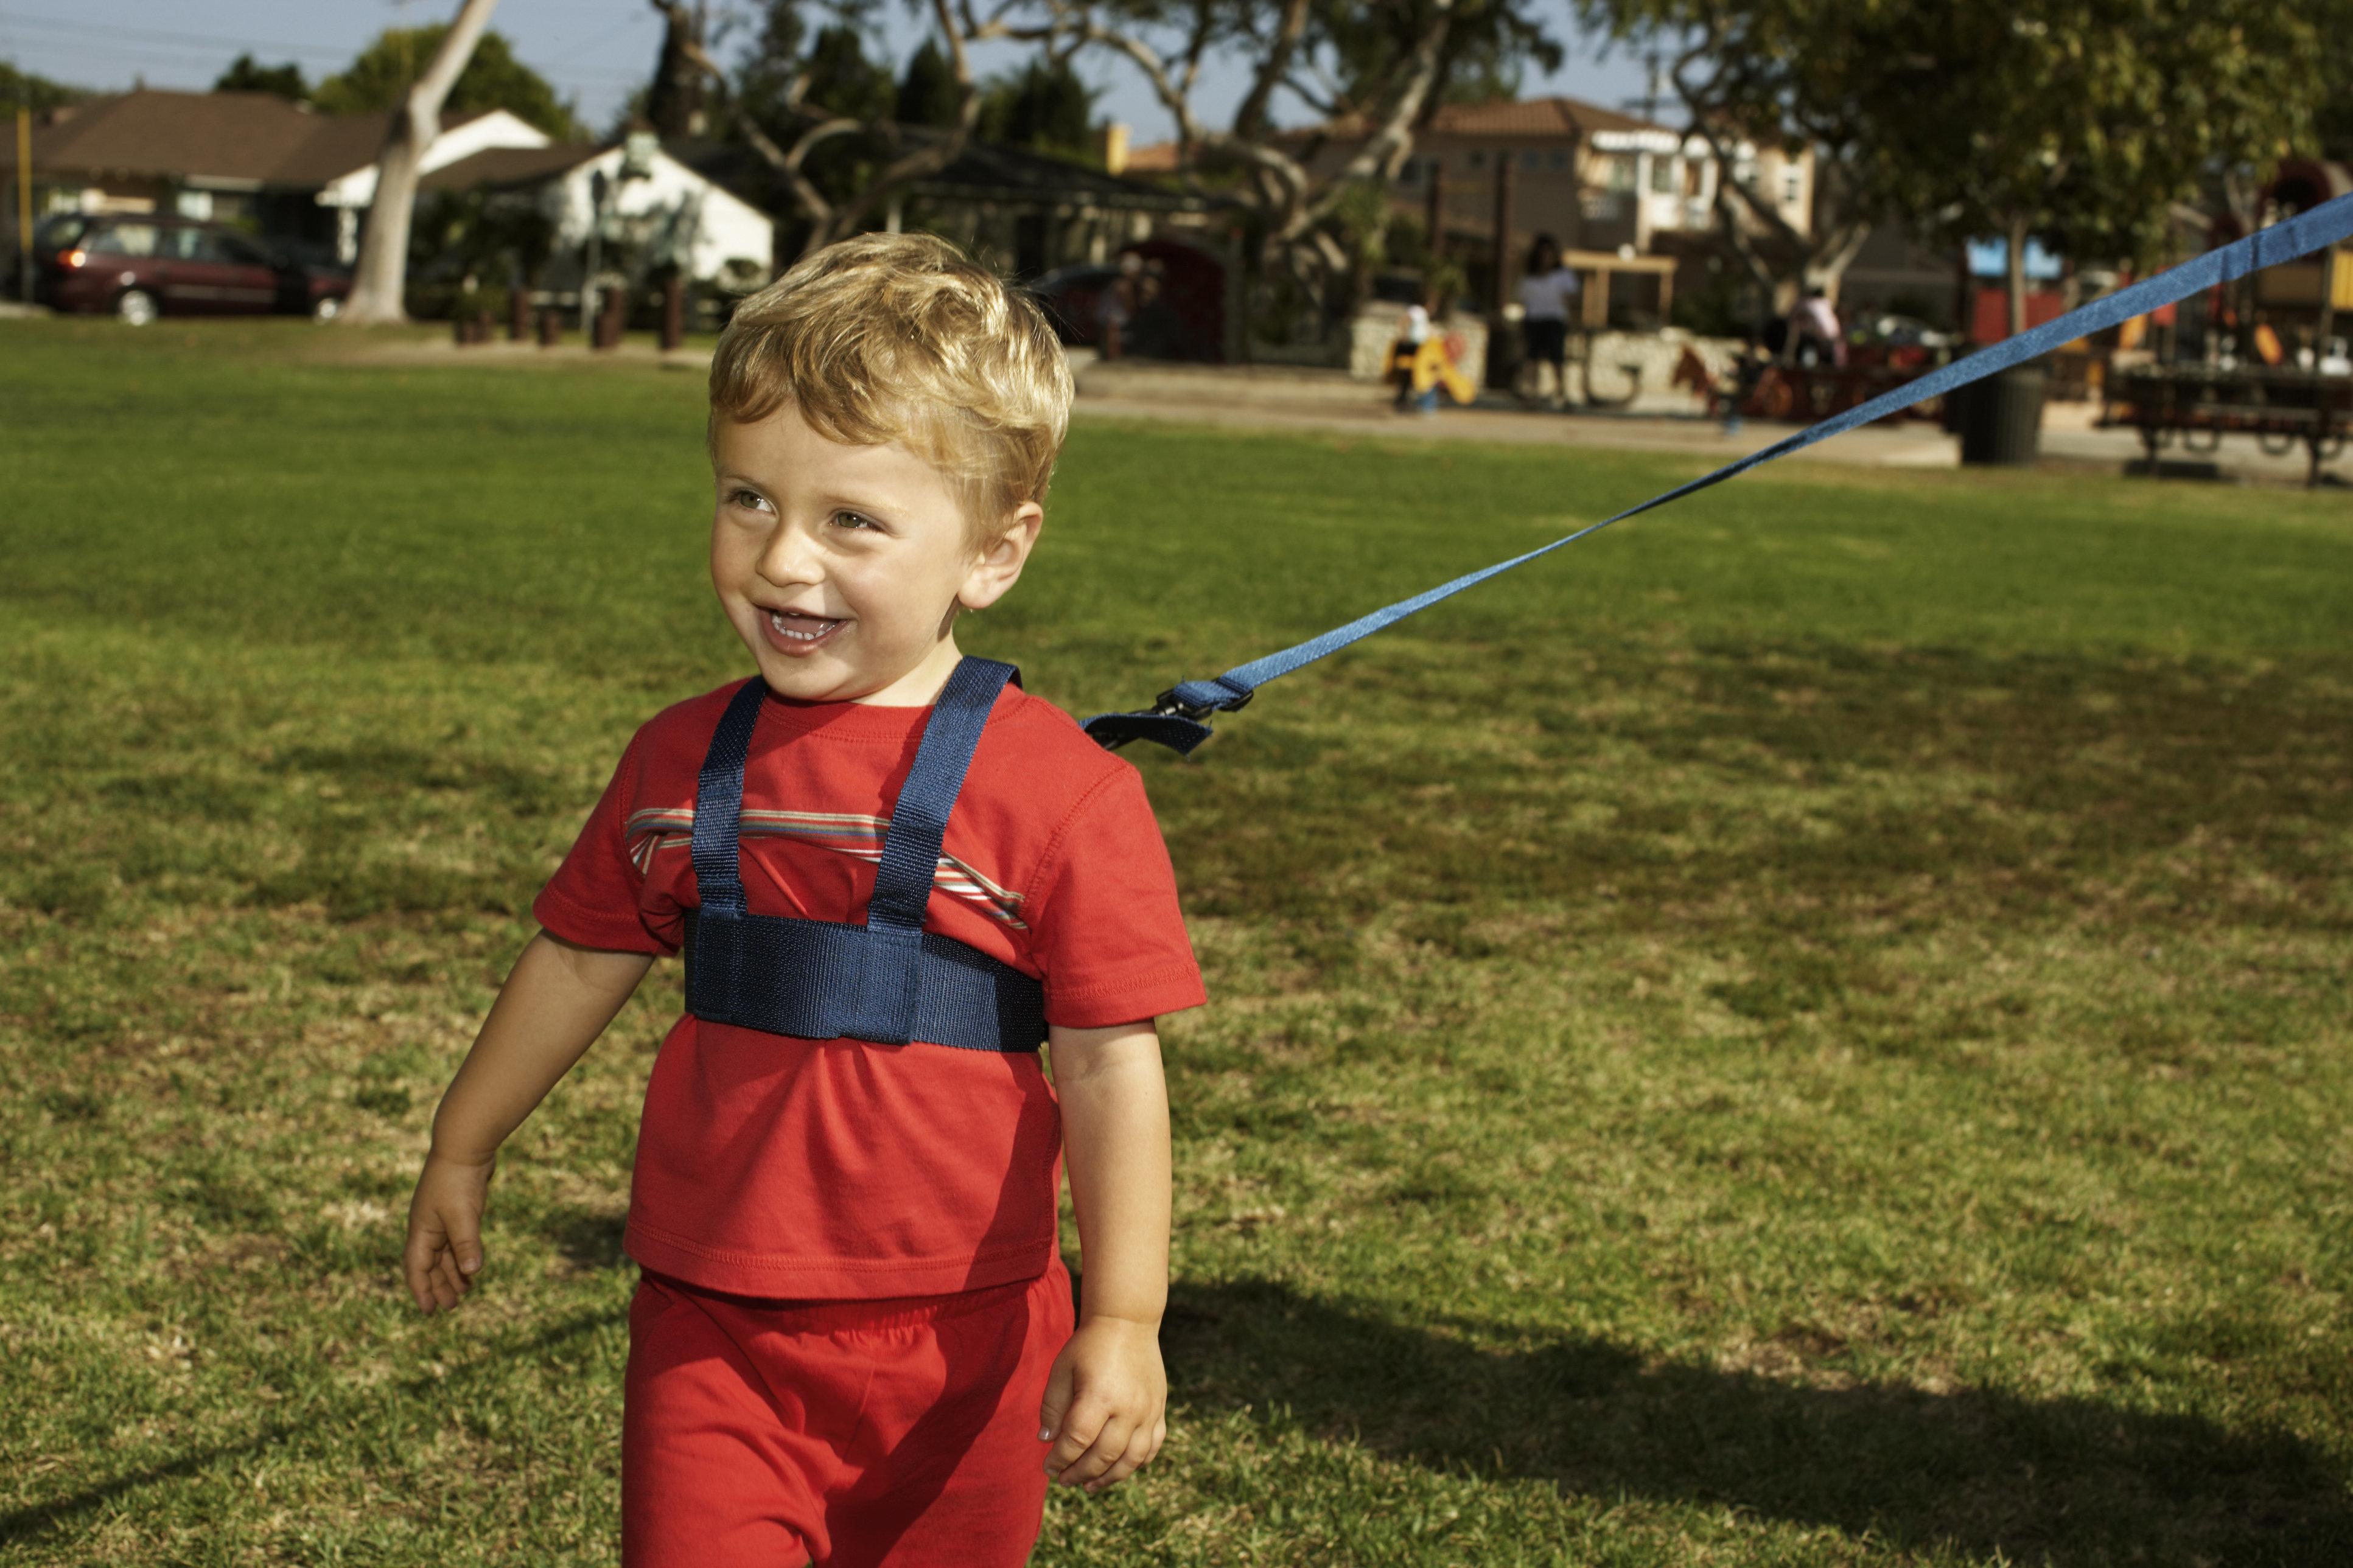 Boy (12-15 months) wearing harness in park